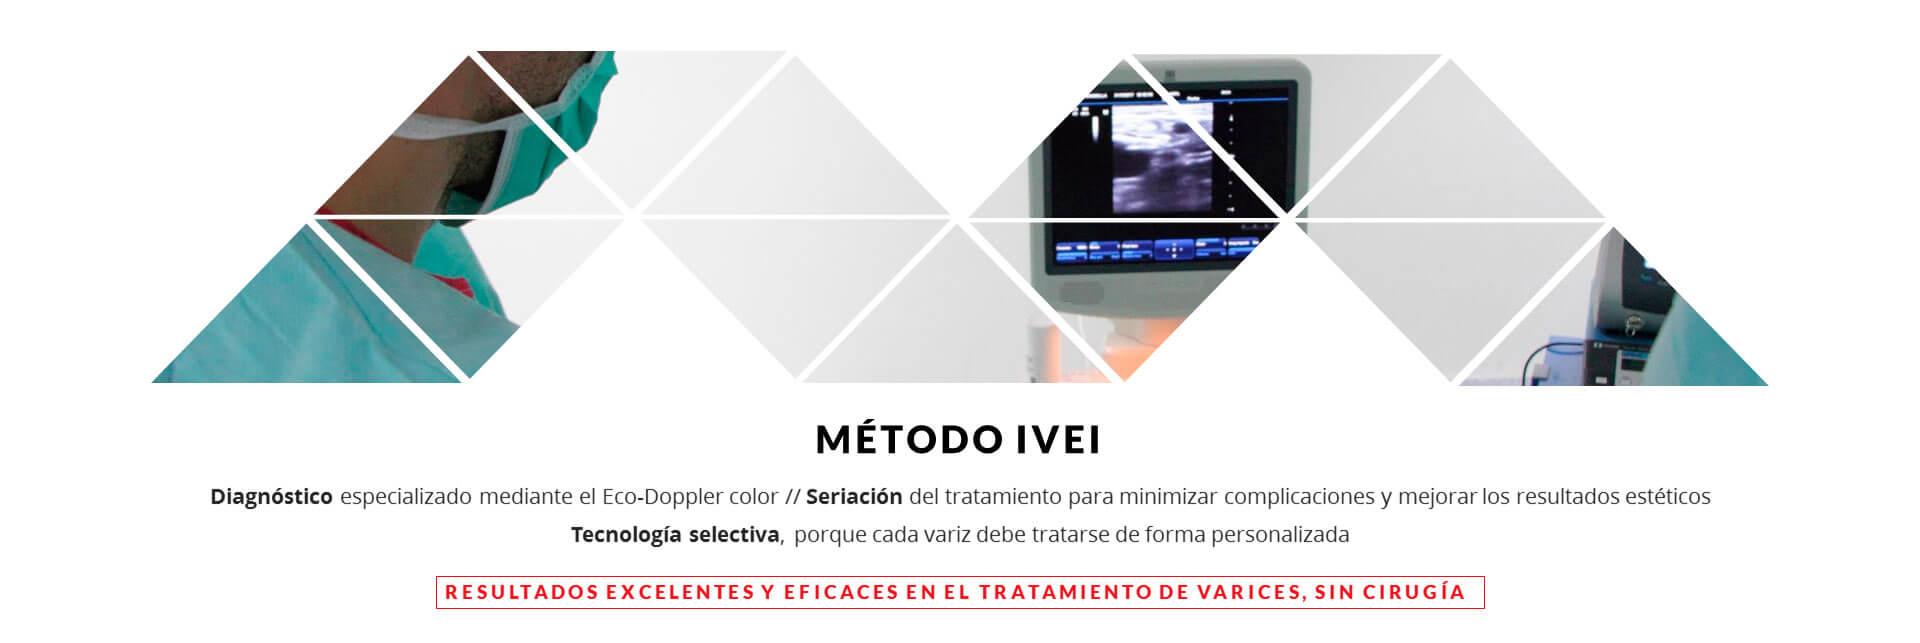 Metodo IVEI elminar varices